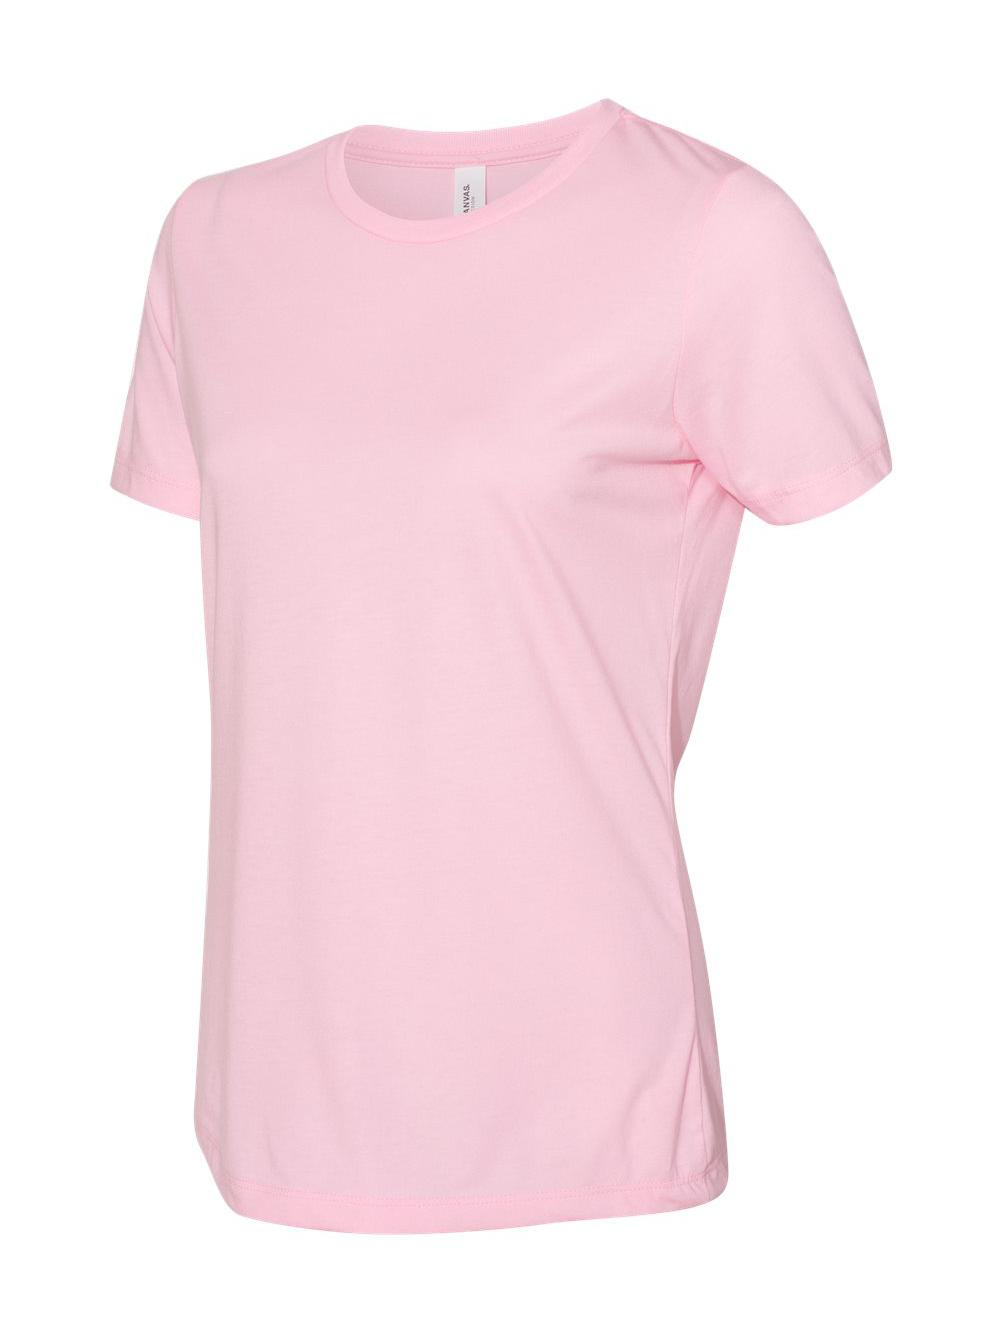 Bella-Canvas-Women-039-s-Relaxed-Short-Sleeve-Jersey-Tee-6400 thumbnail 68